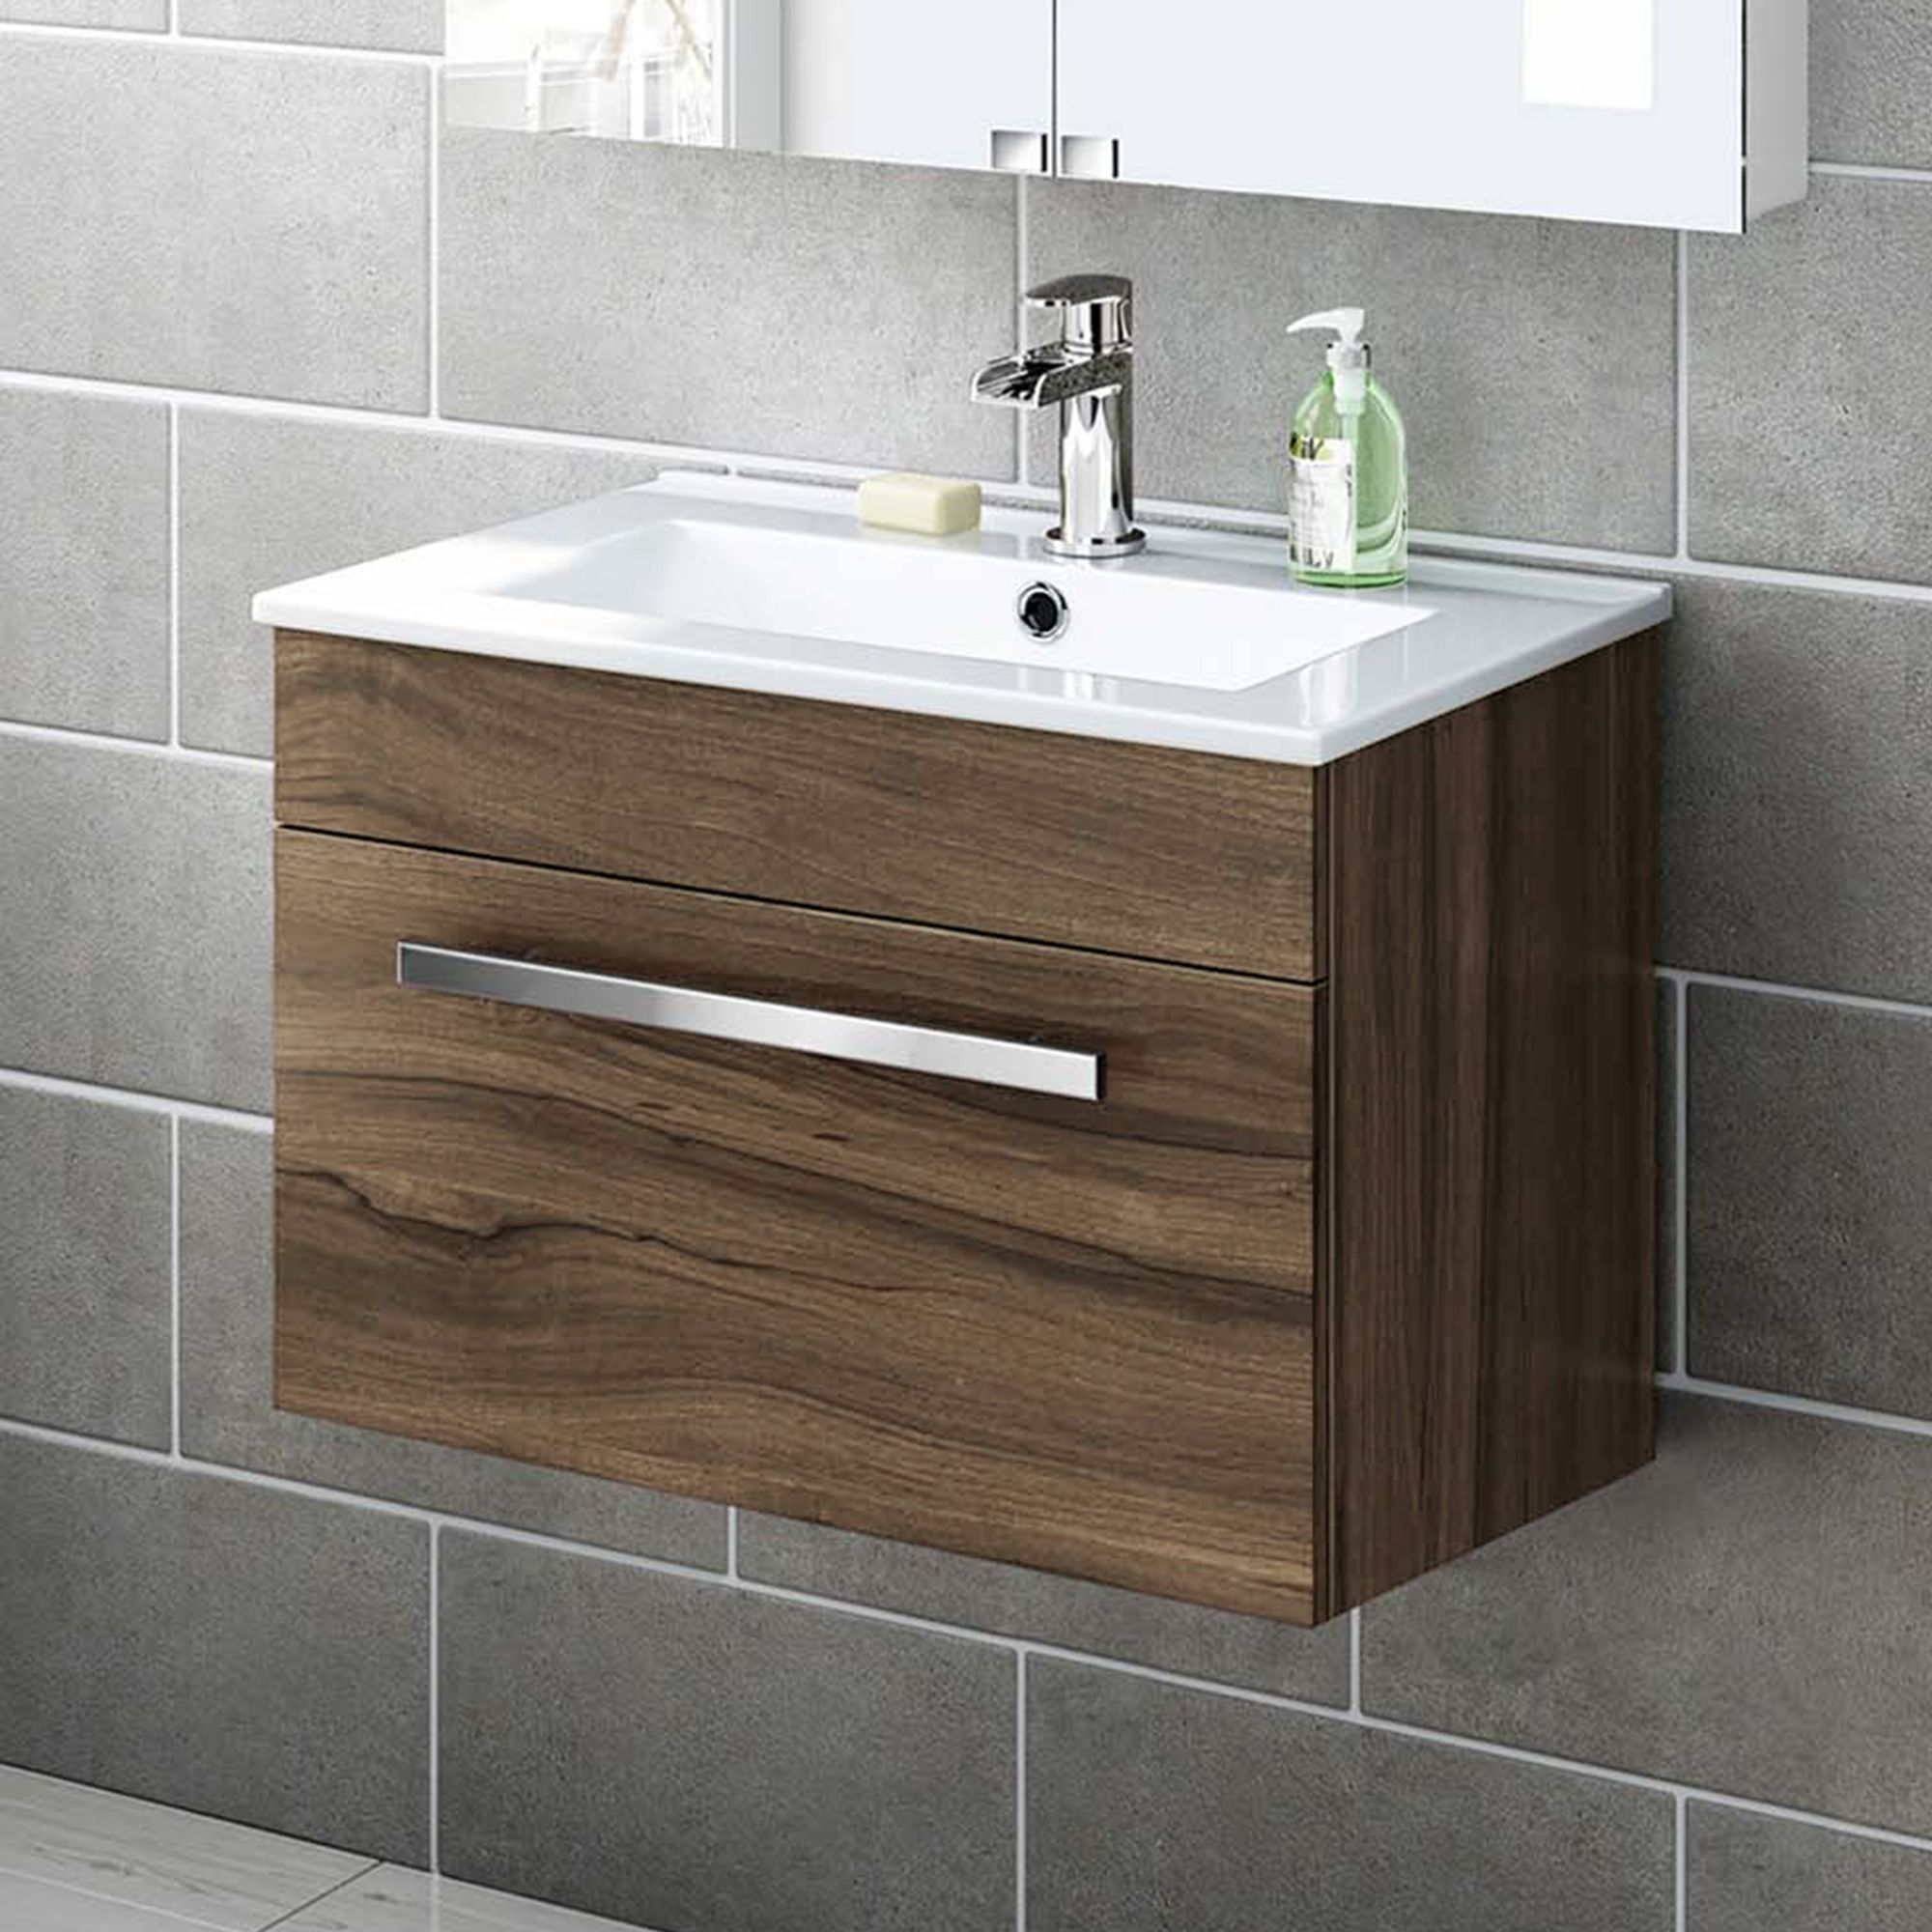 600mm Walnut Wall Hung Basin Cabinet Avon Bathempire With